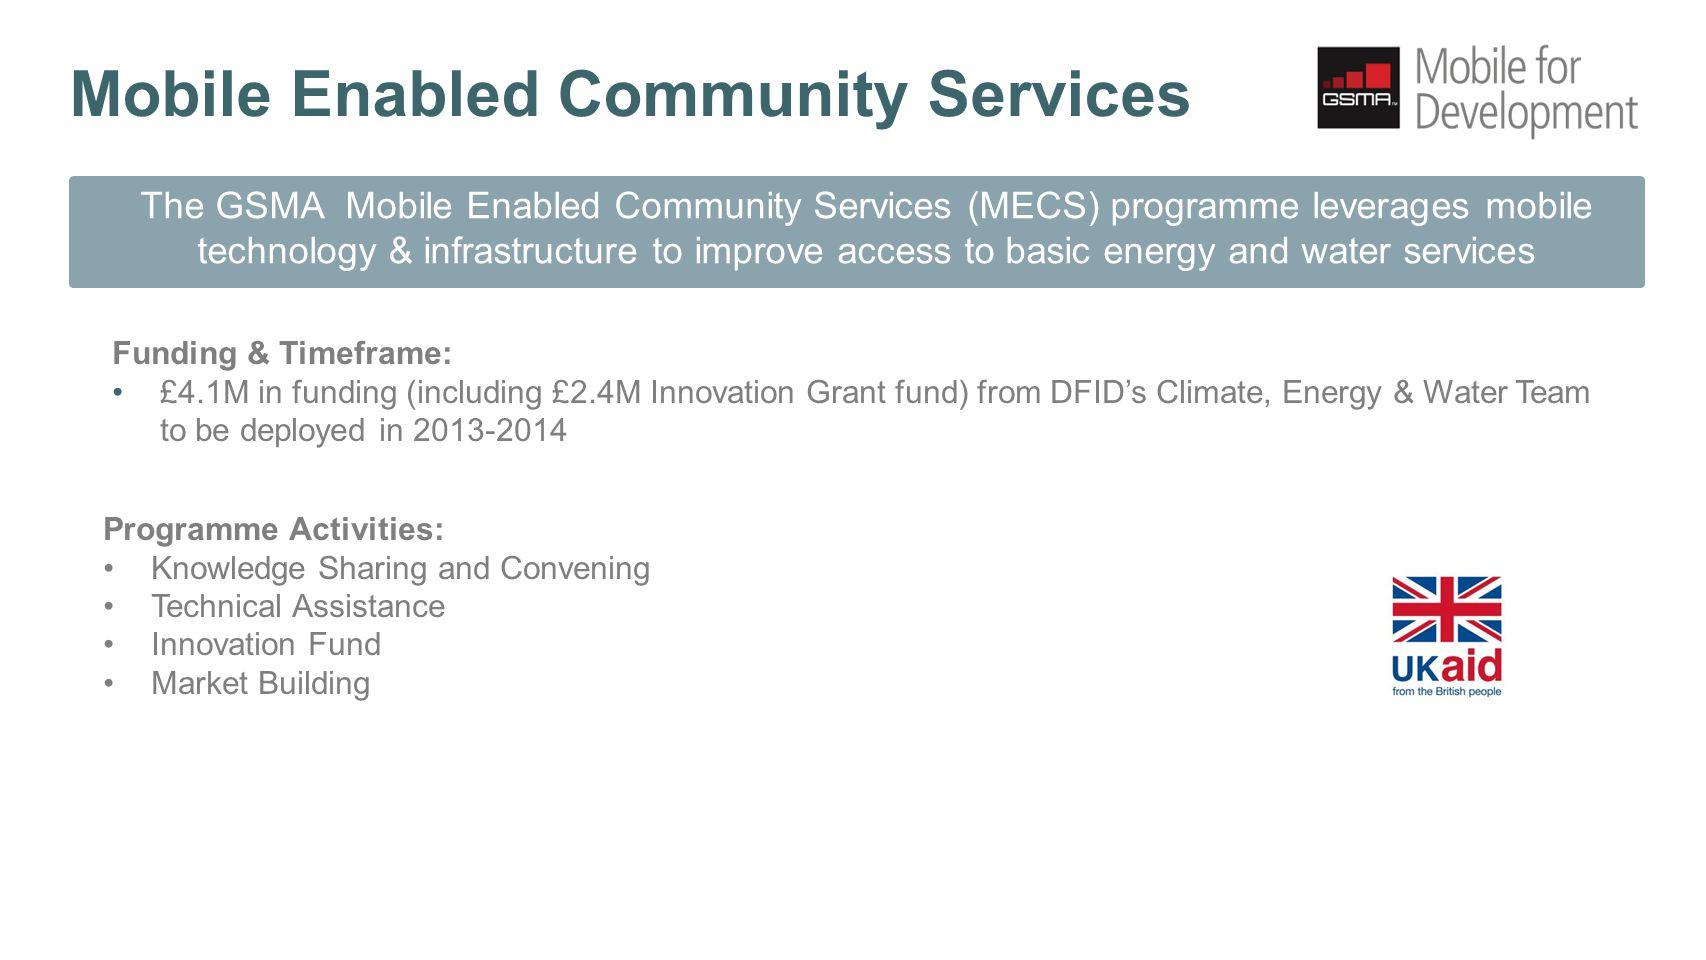 The MECS Market Opportunity & Innovation Fund